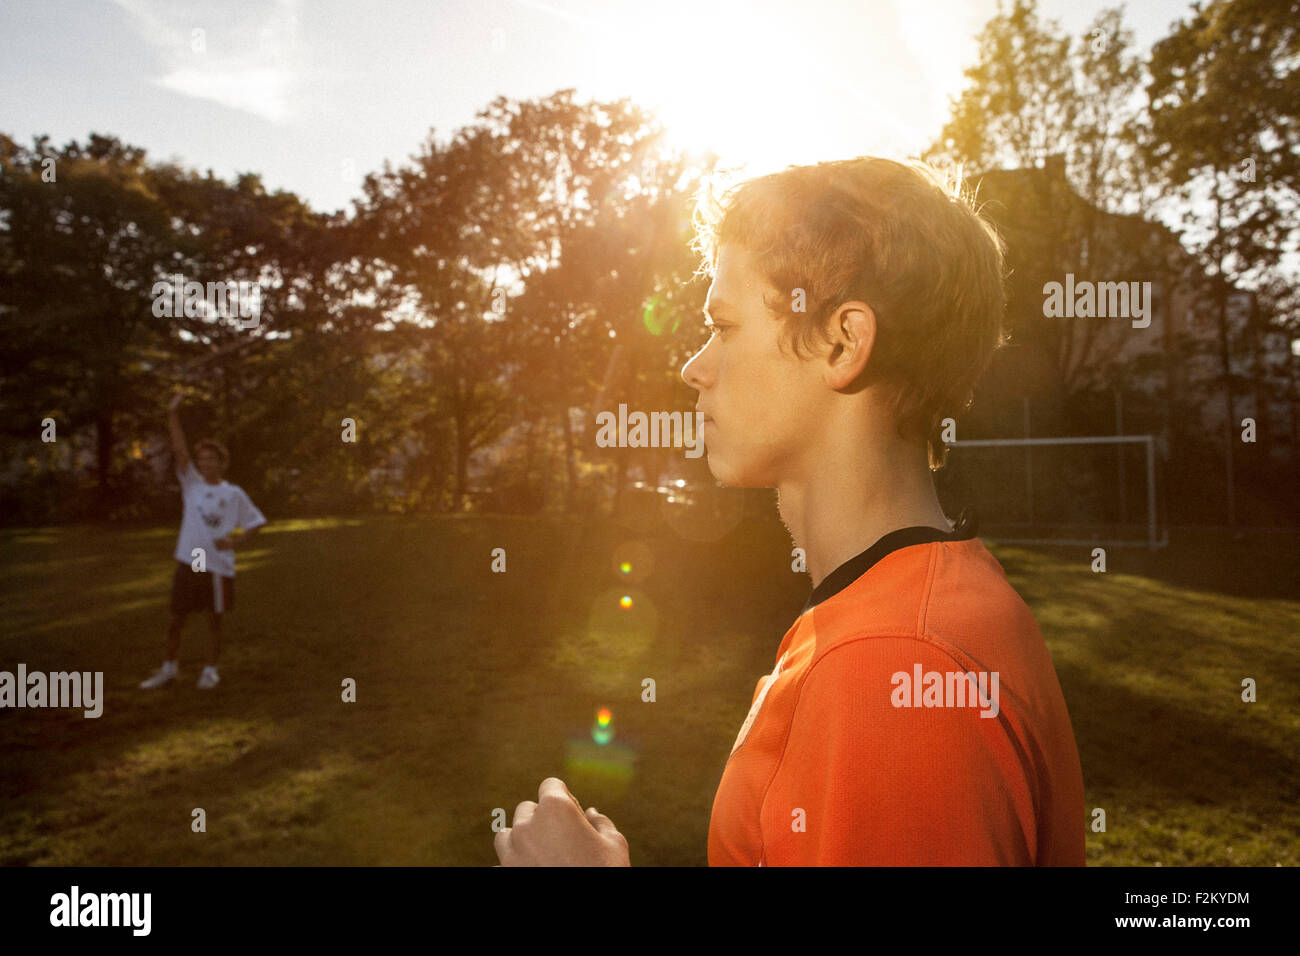 Adolescent sur terrain de football Banque D'Images